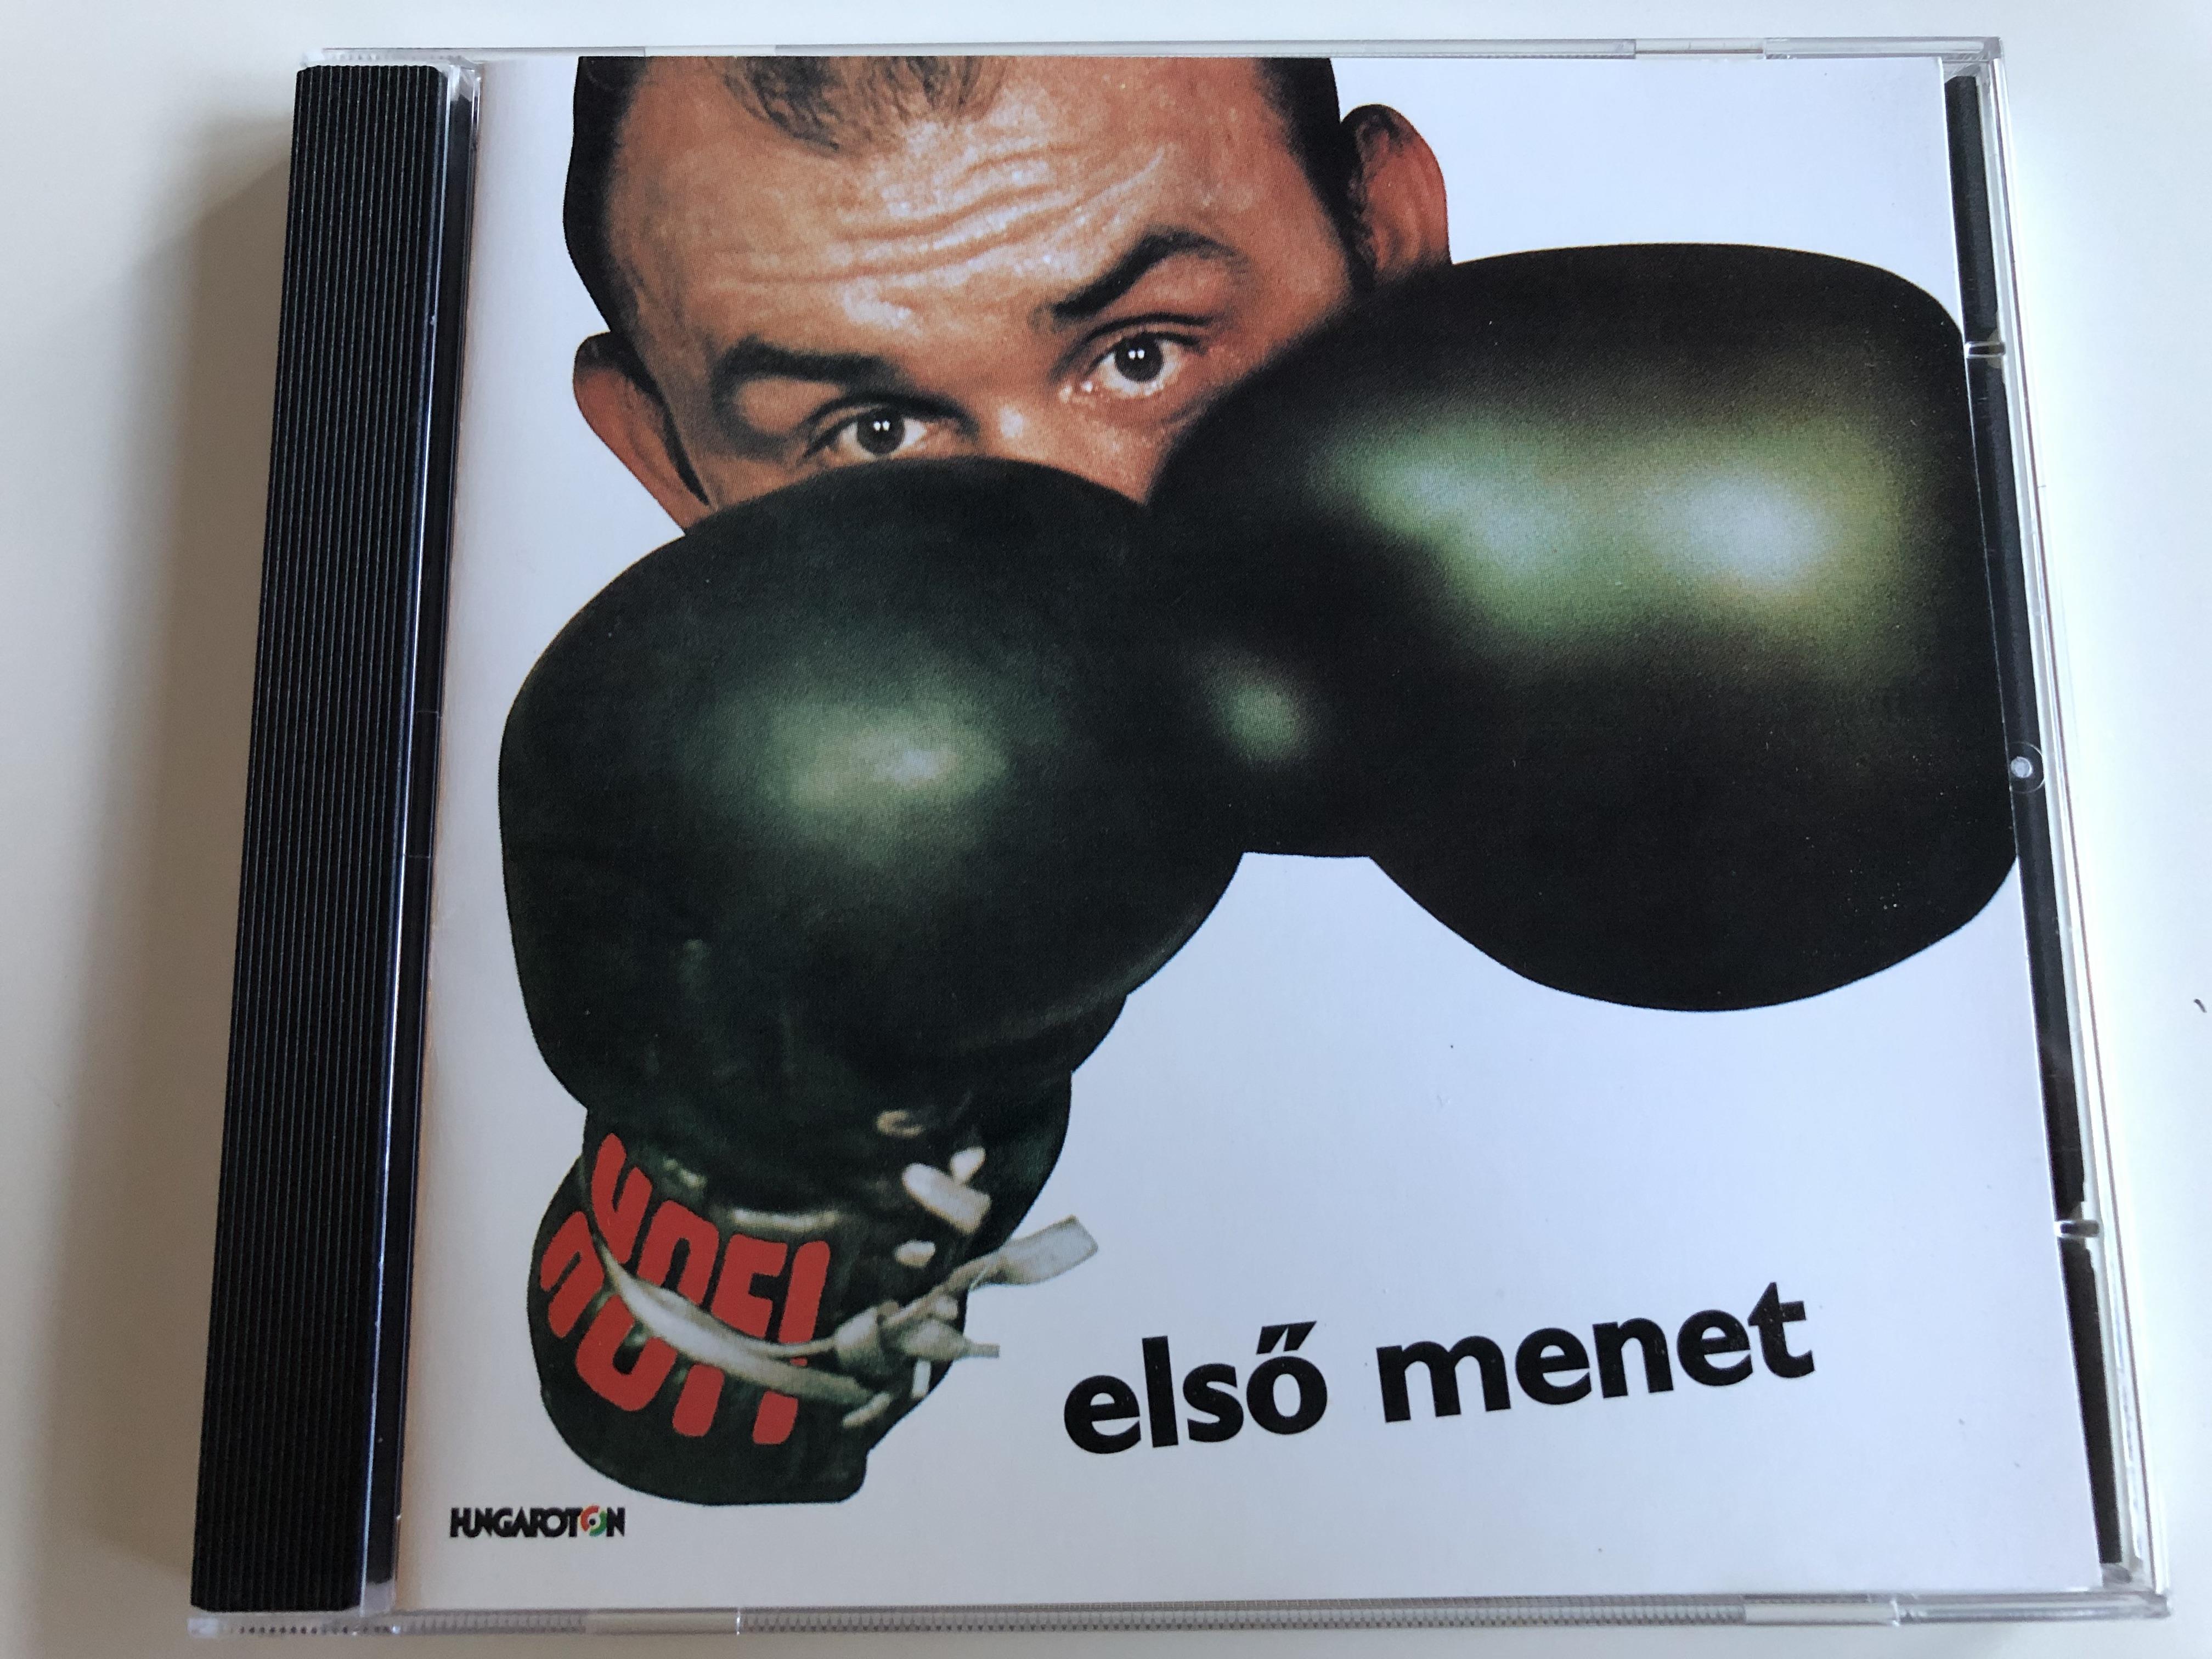 hofi-els-menet-audio-cd-2001-hungaroton-hcd-17420-hungarian-stand-up-comedy-show-with-g-za-hofi-1-.jpg